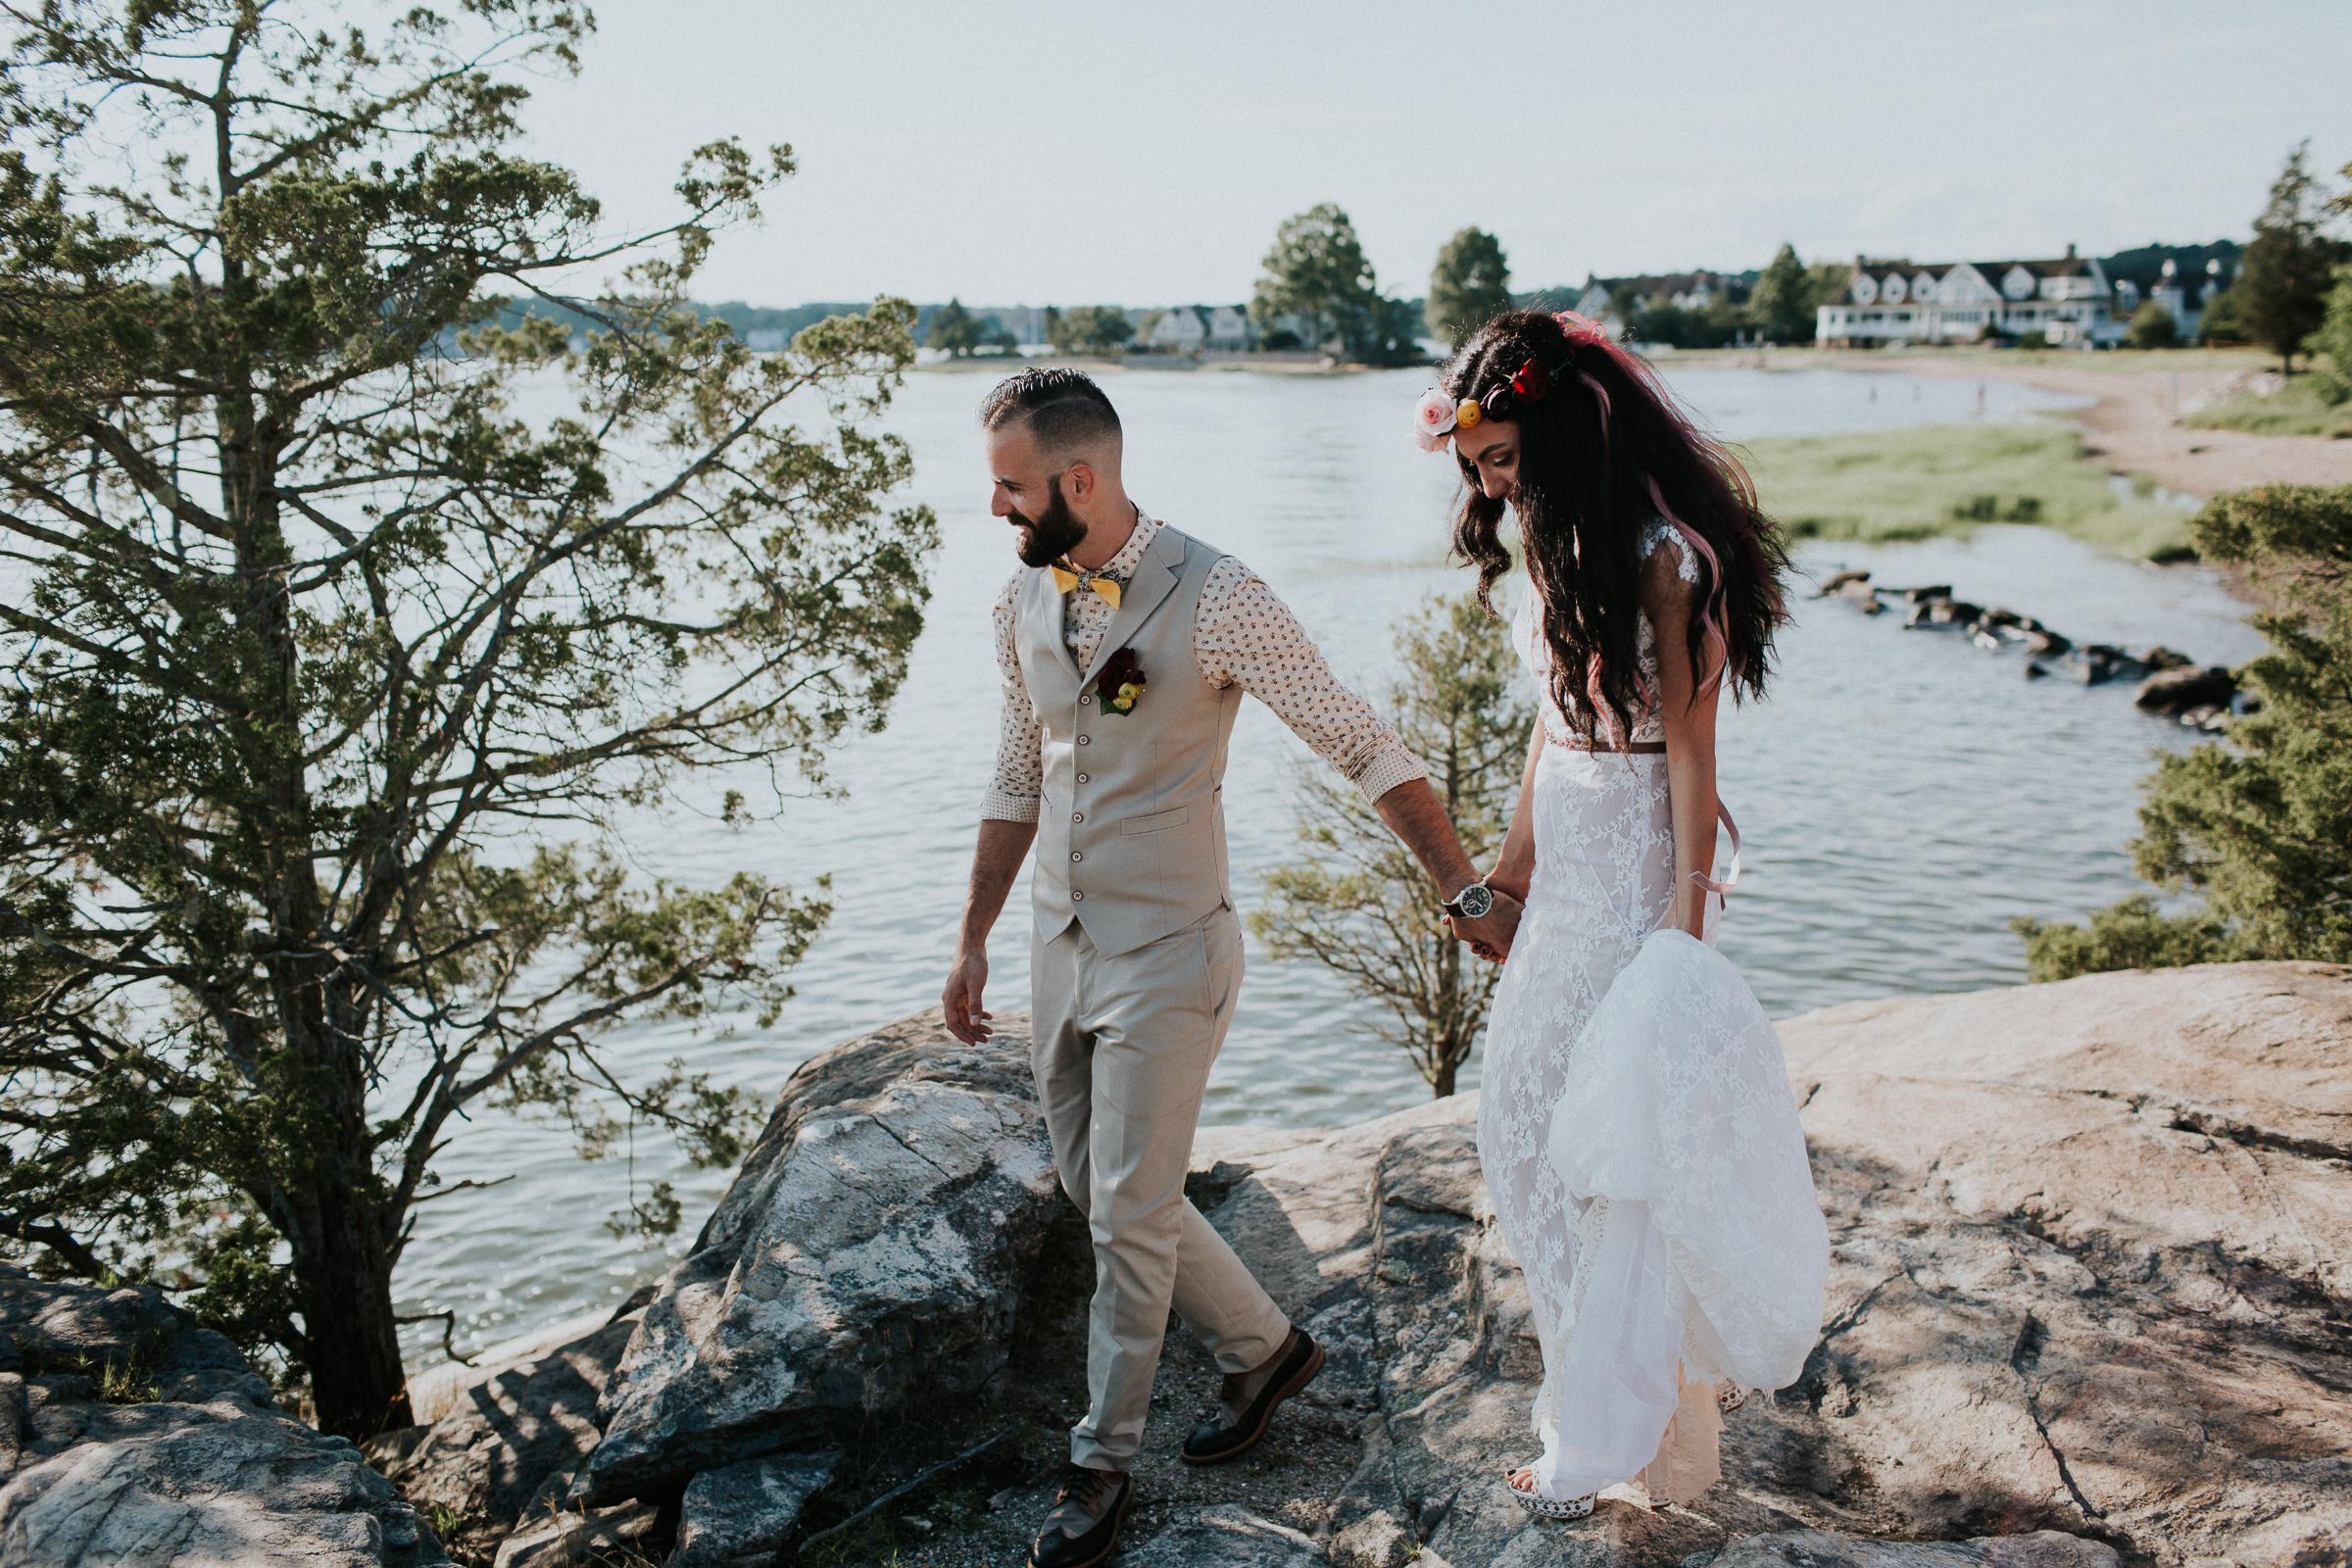 Backyard-Intimate-Adventurous-Destination-Wedding-Darien-Connecticut-Documentary-Wedding-Photography-79.jpg